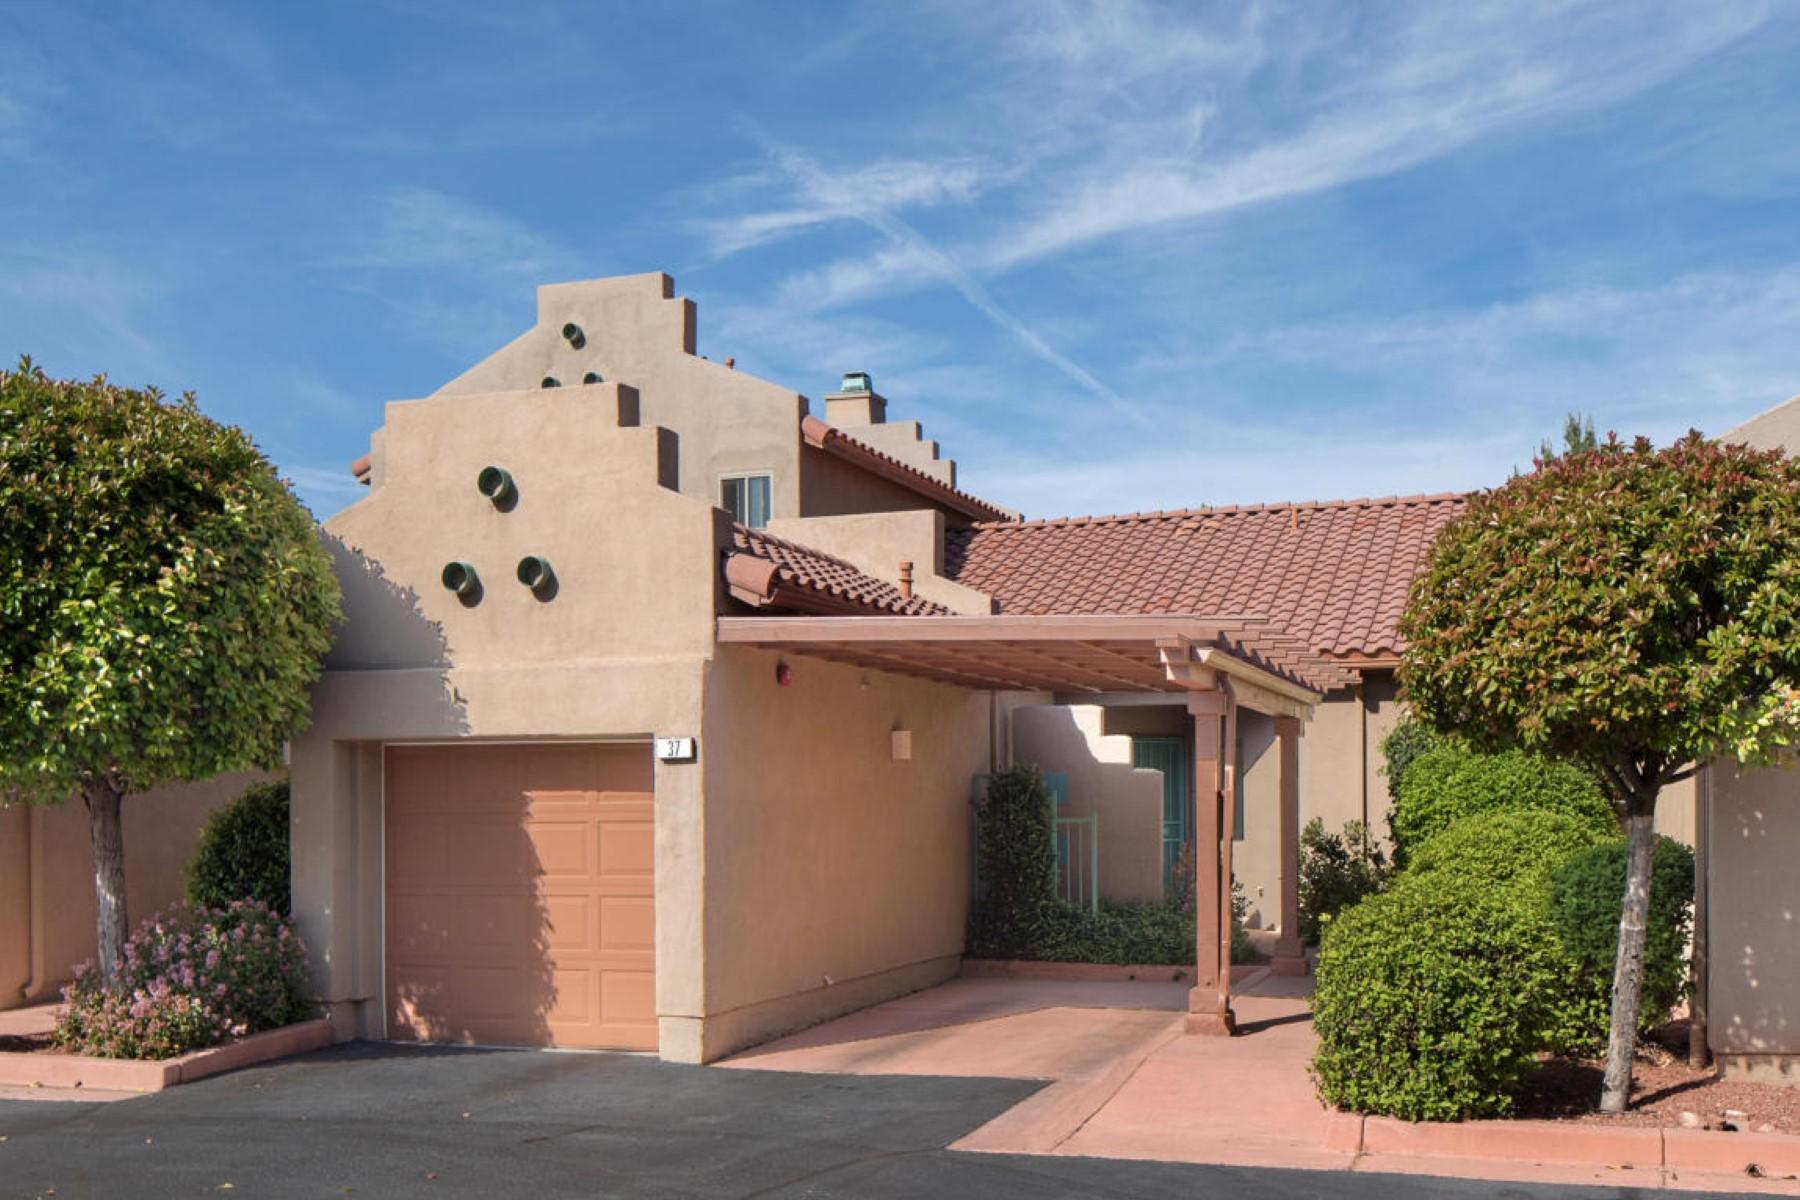 Таунхаус для того Продажа на Lovely townhome in Sedona 37 Desert Willow Lane Sedona, Аризона, 86336 Соединенные Штаты